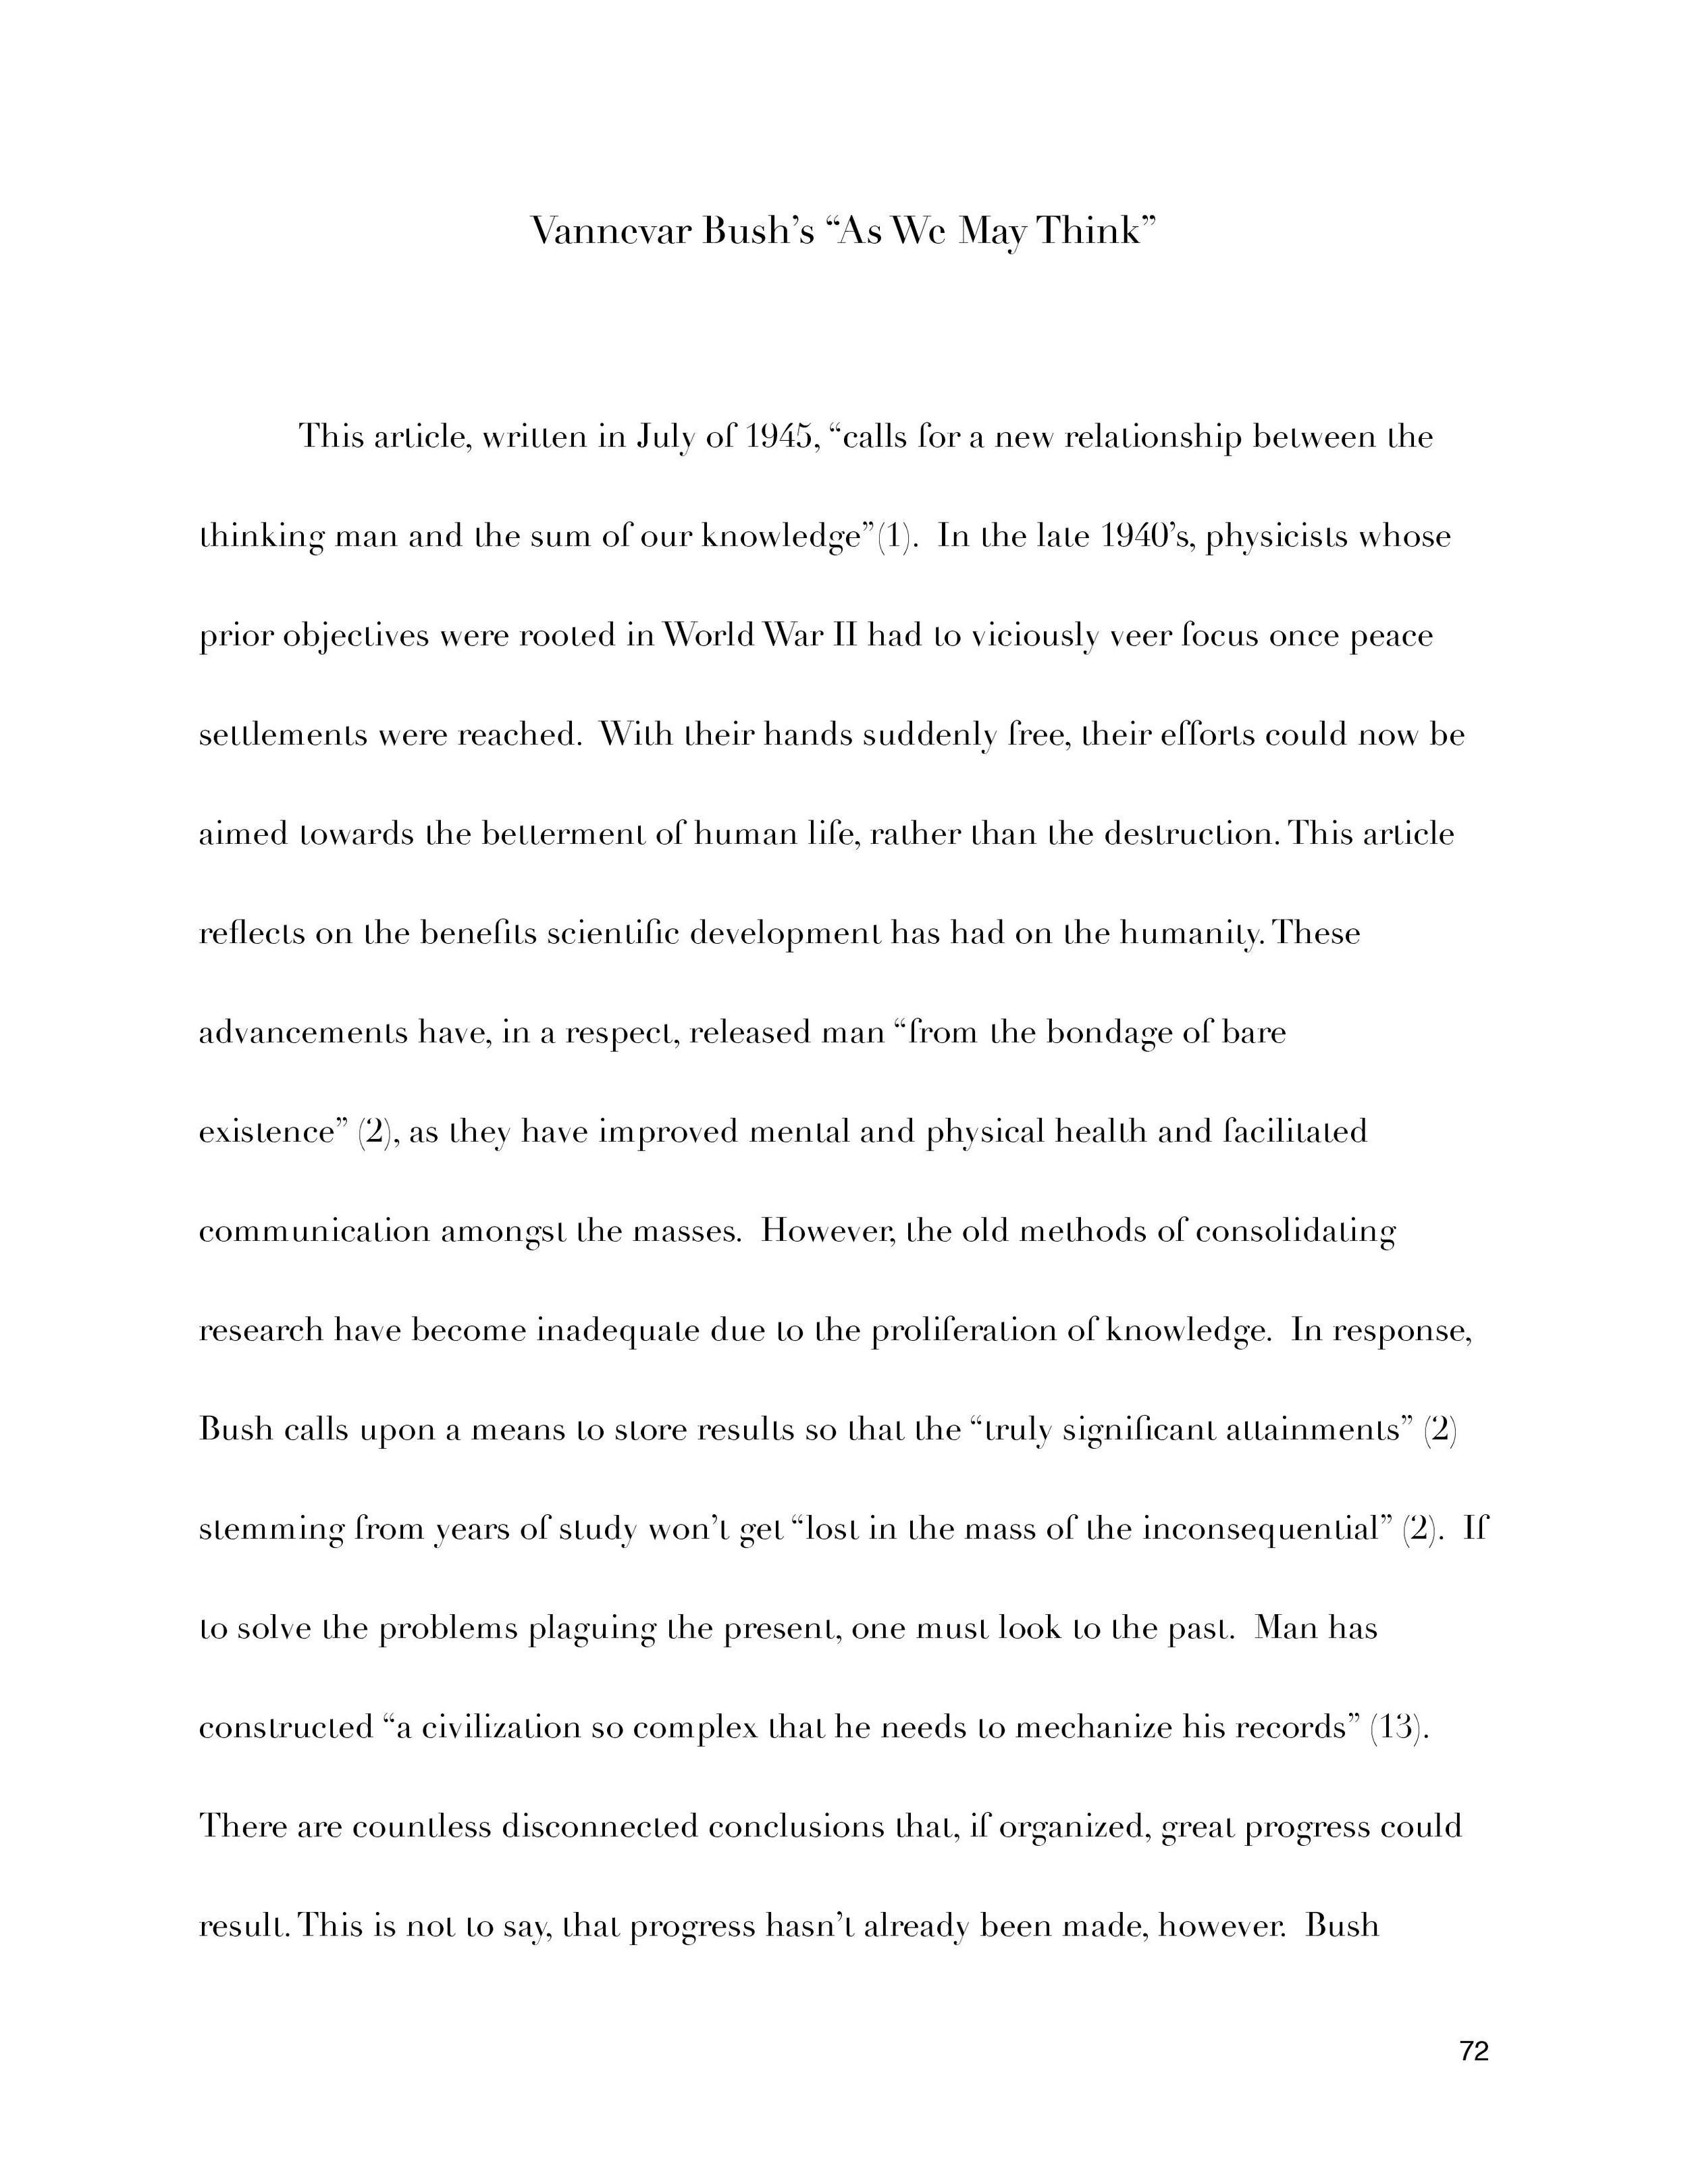 ShatteredGlass-page-073.jpg